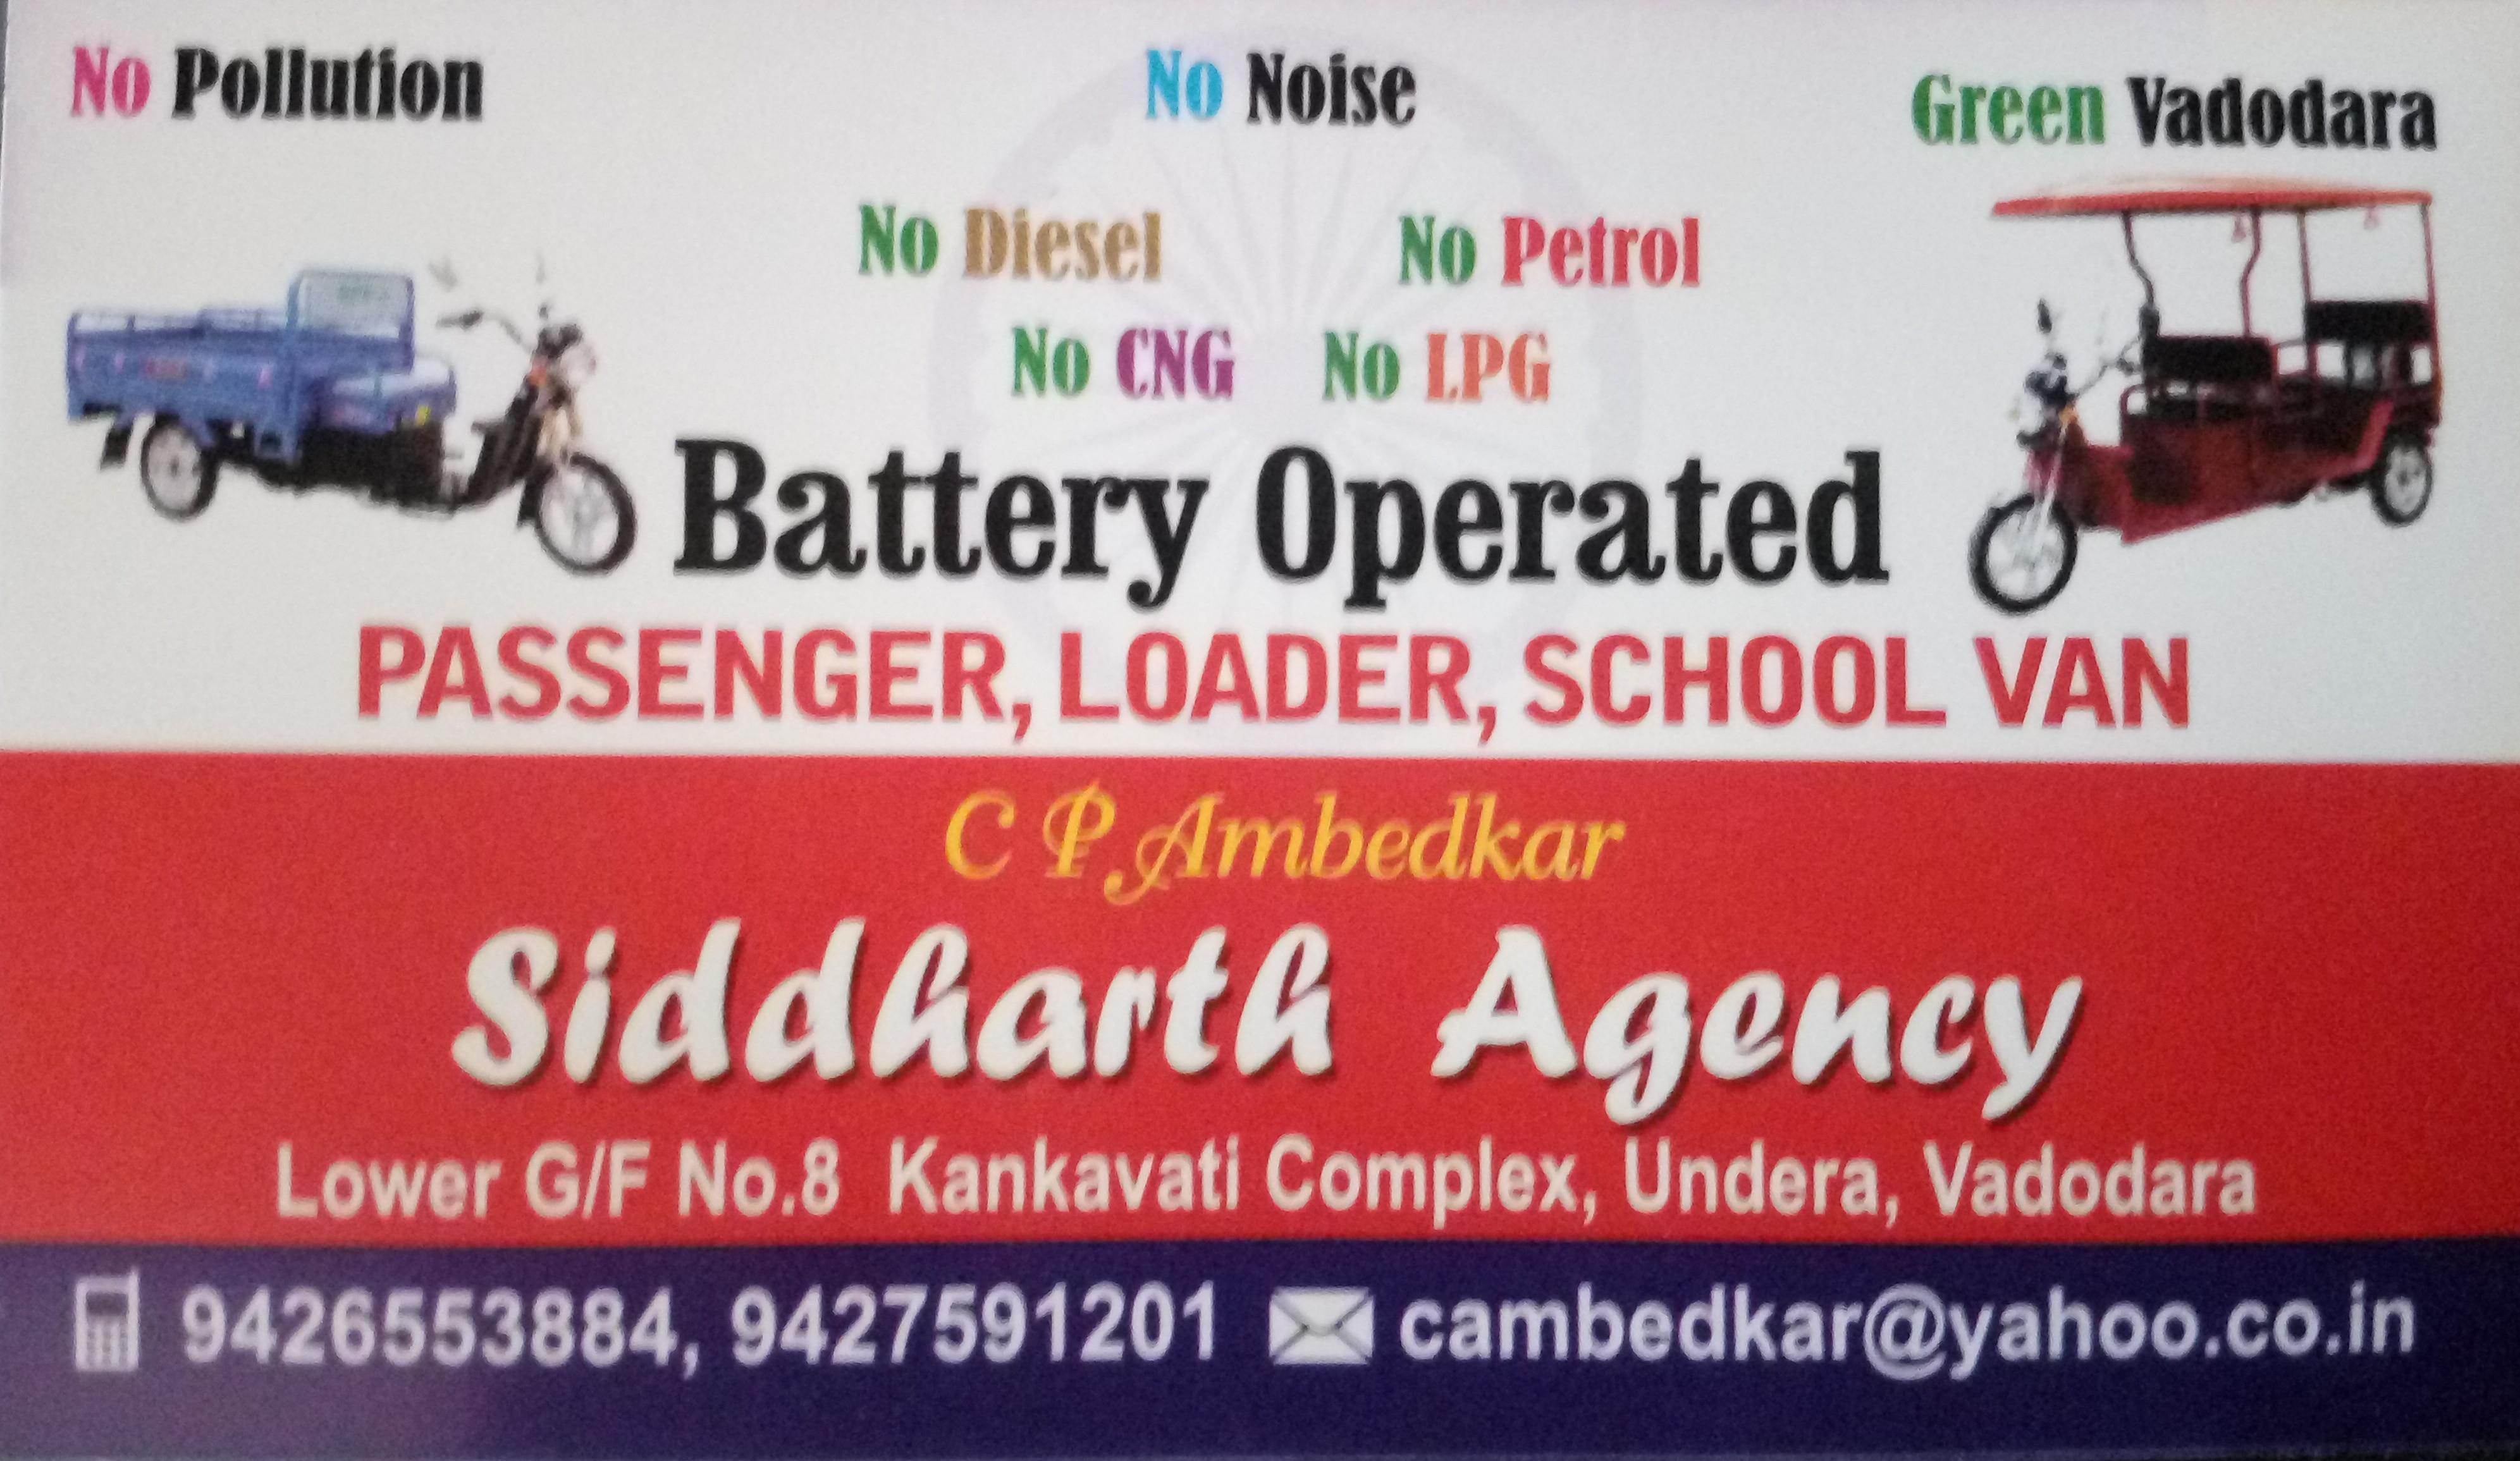 E-Rickshaw supply all over Gujarat State Approved by Govt. of India & Govt. Gujarat. Visit our Showroom Siddharth Agency Shop No. 8 Kankavati , UNDERA , Vadodara